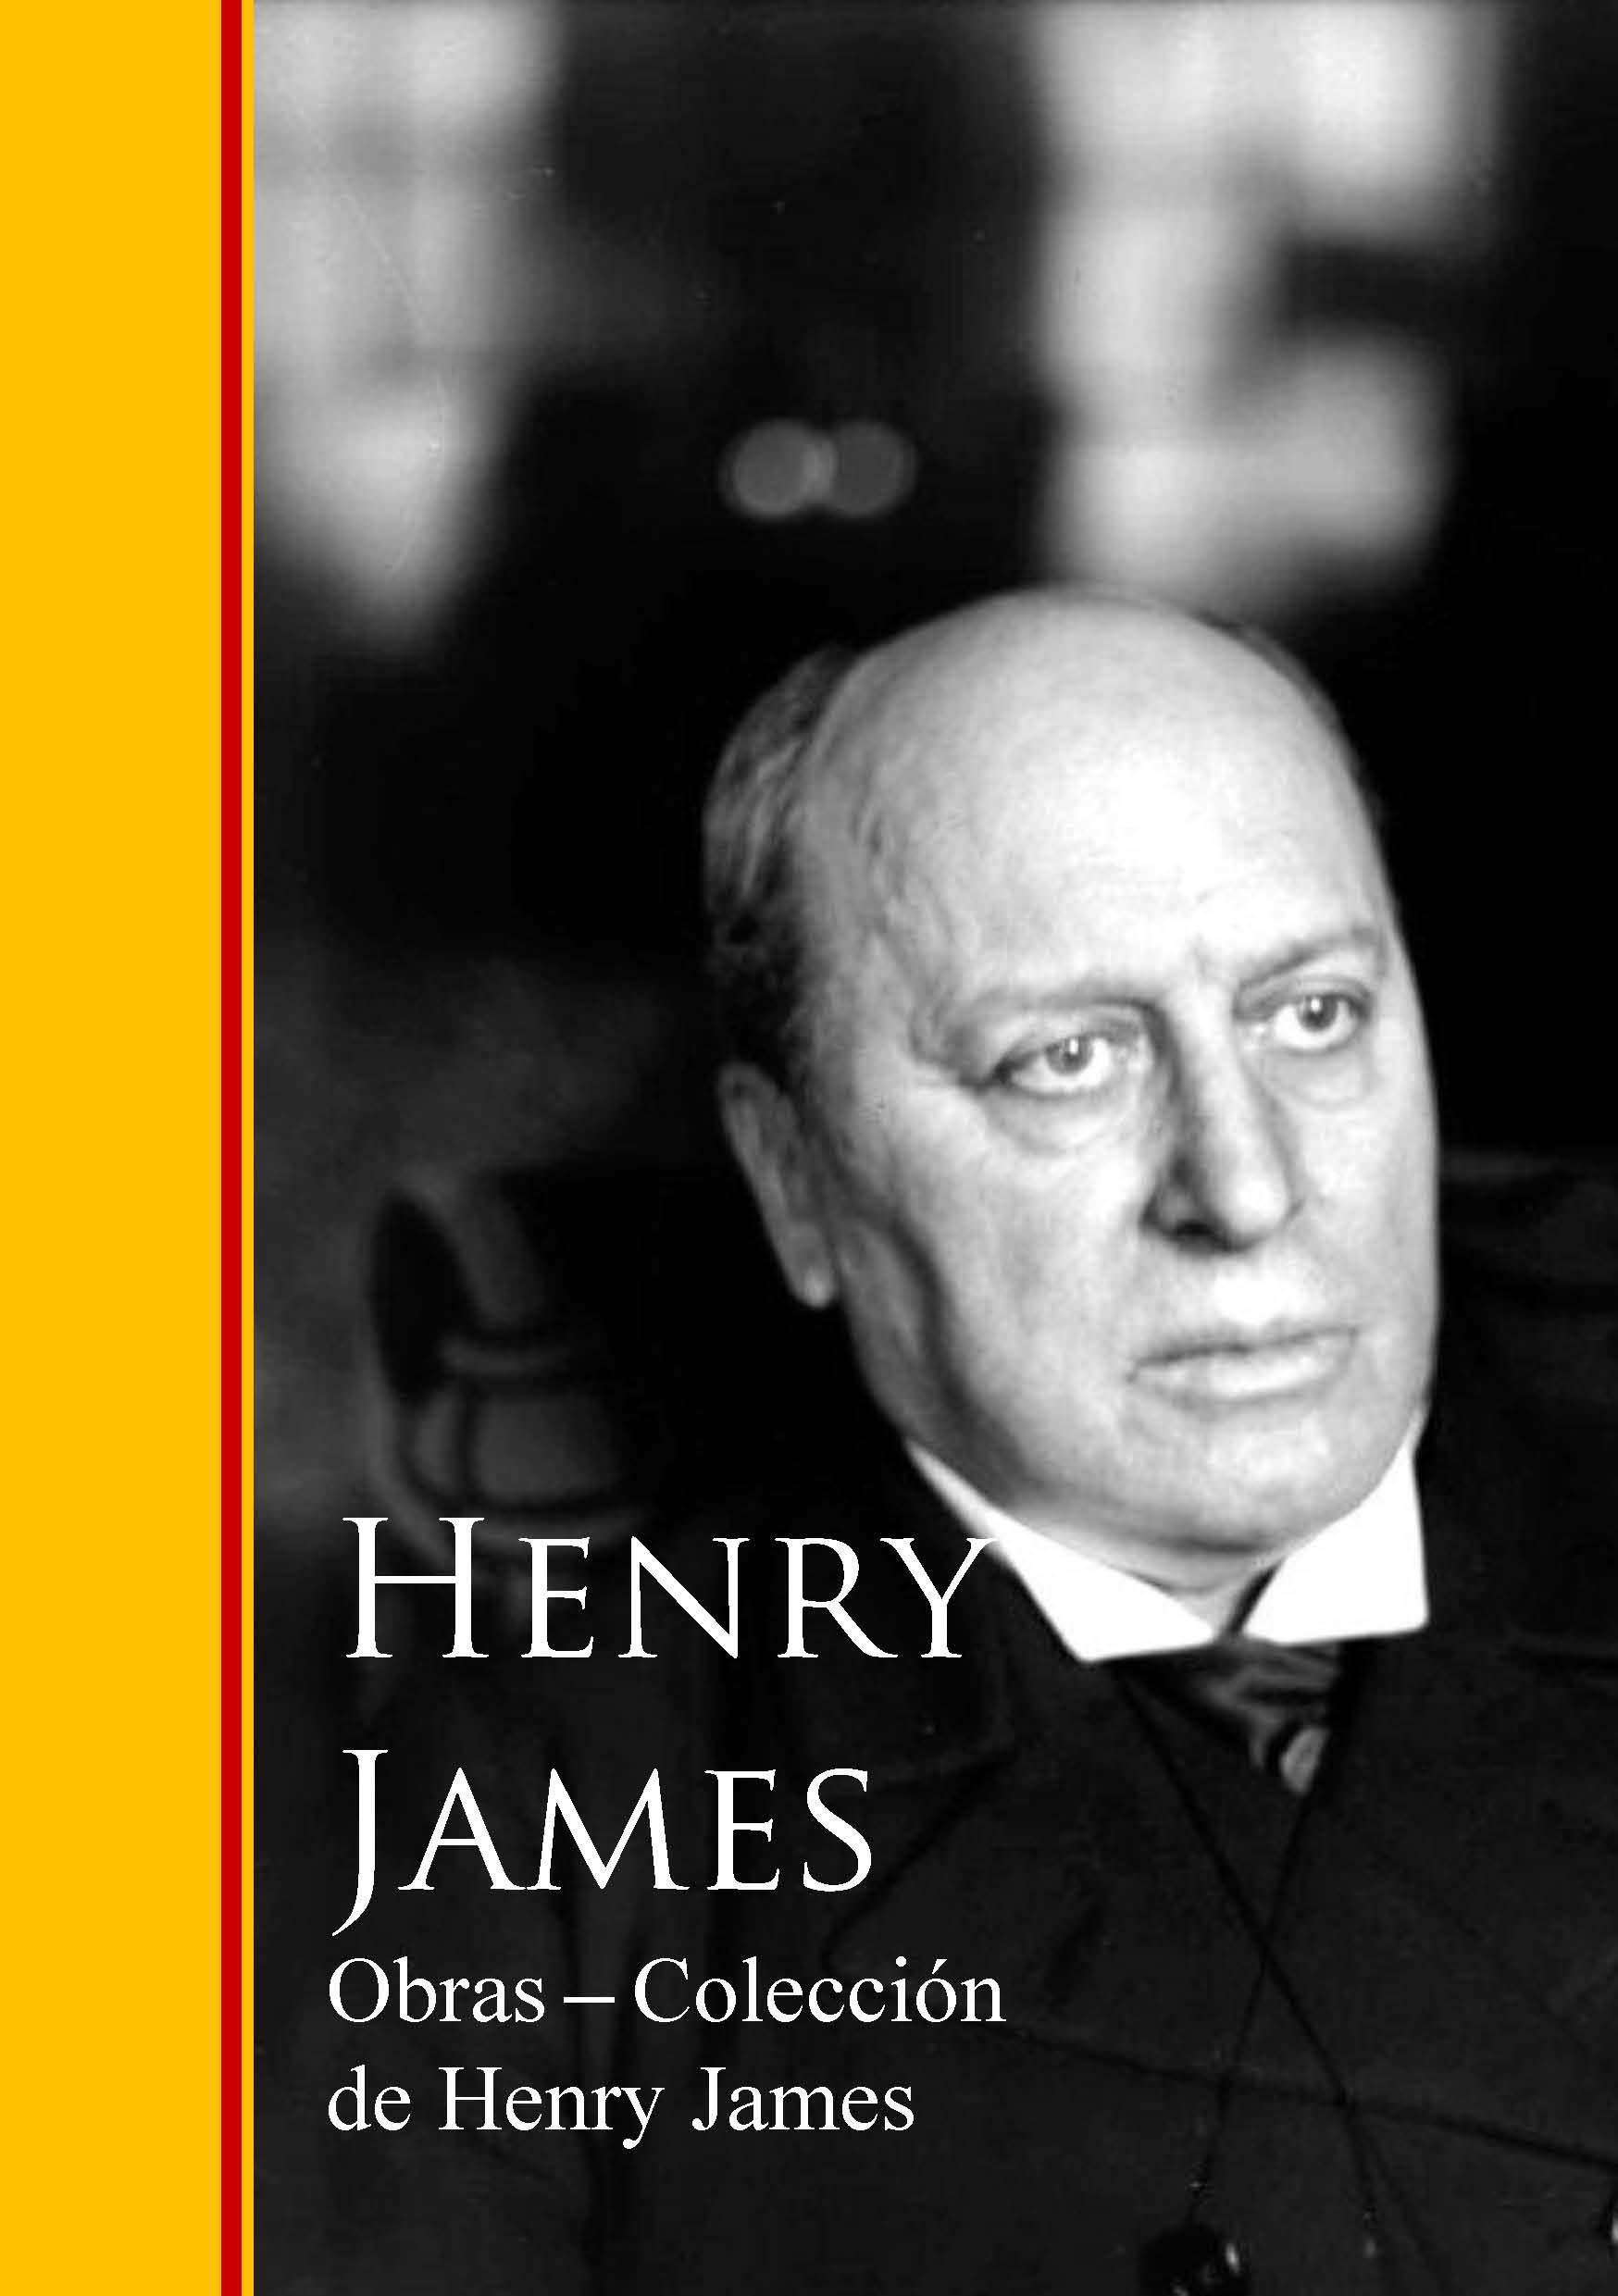 Obras - Coleccion de Henry James